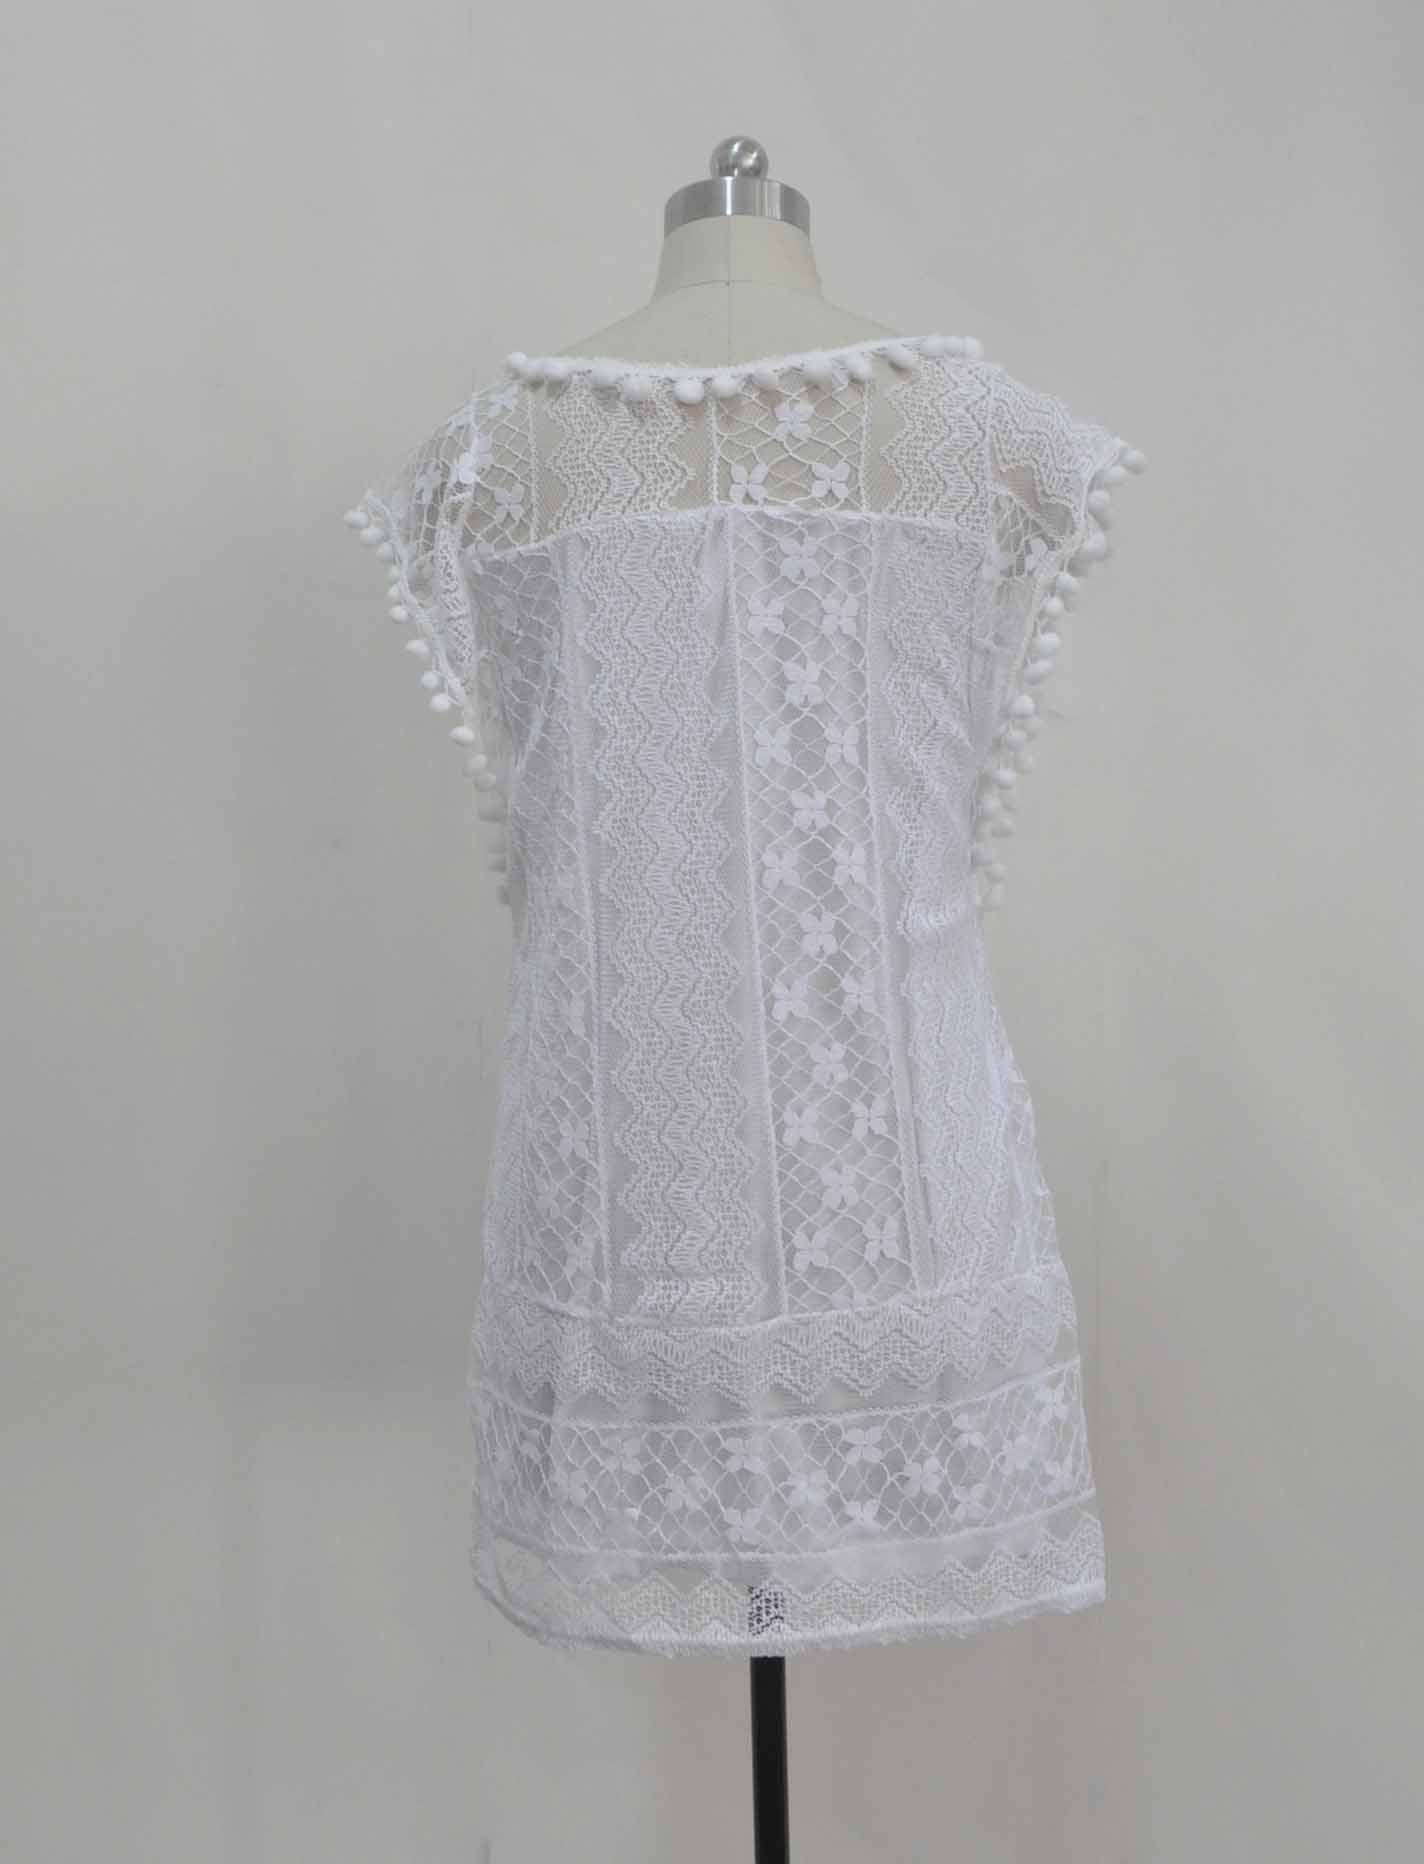 6e2d1b2db9fc $34.41 - Nice UZZDSS Summer Dress 2018 Women Casual Beach Short Dress  Tassel Black White Mini Lace Dress Sexy Party Dresses Vestidos S-XXL - Buy  it Now!